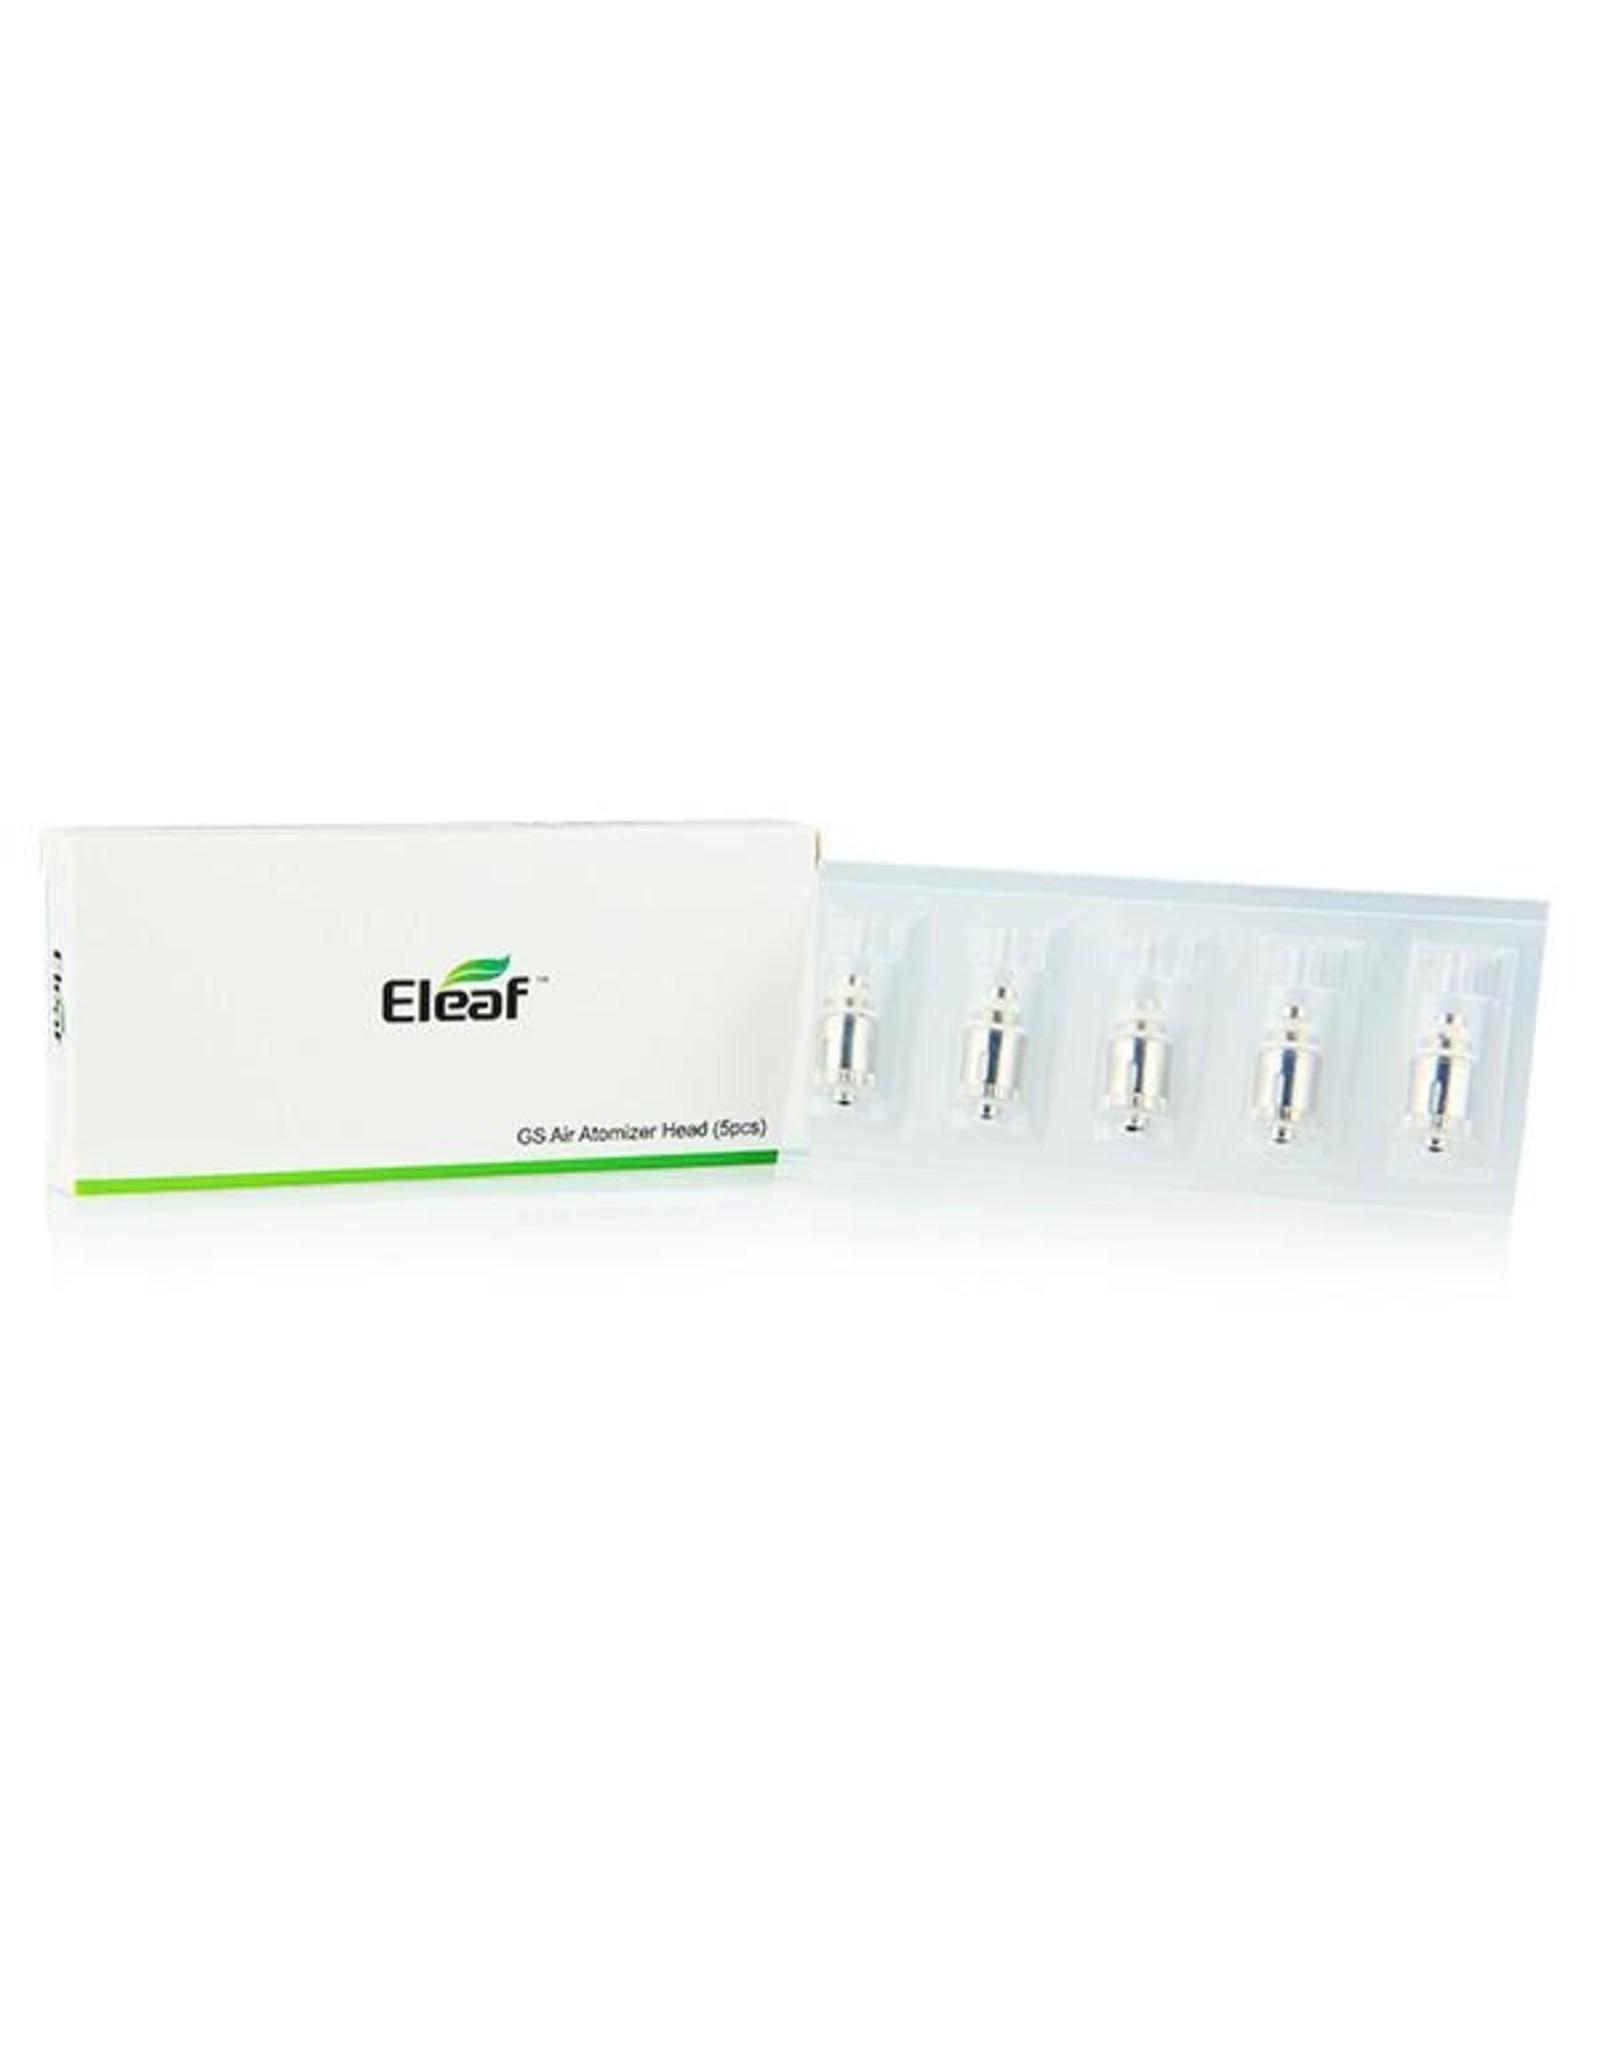 Eleaf Eleaf GS Air Replacement Coils (5/Pk) 1.5 ohm